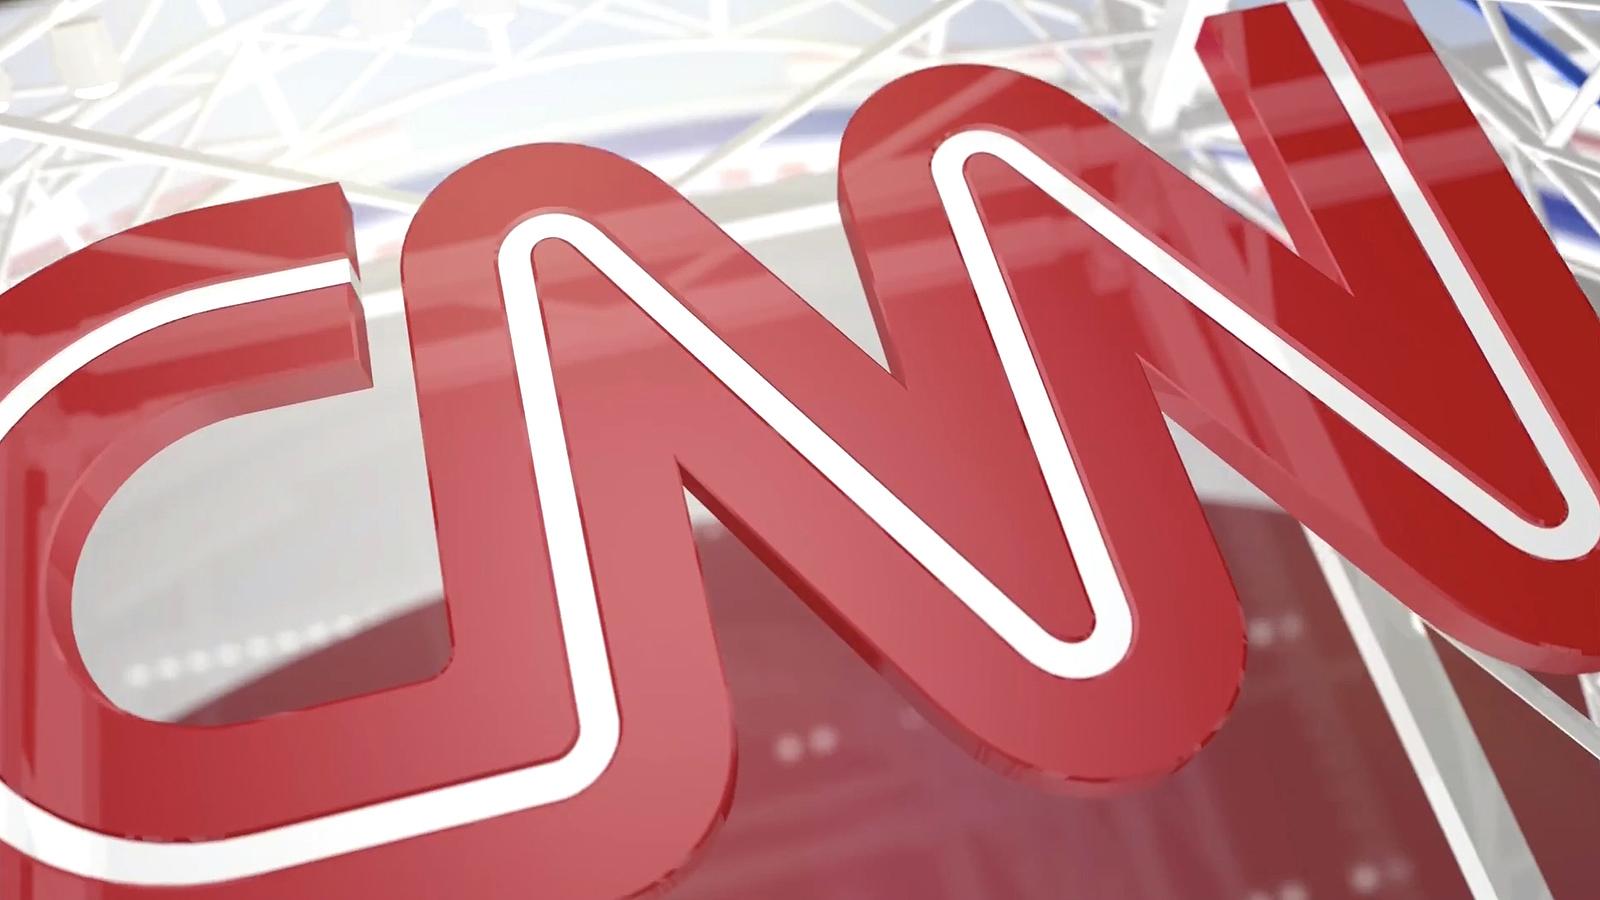 NCS_CNN-Dem-Debate-Cold-Open_Graphics_0014